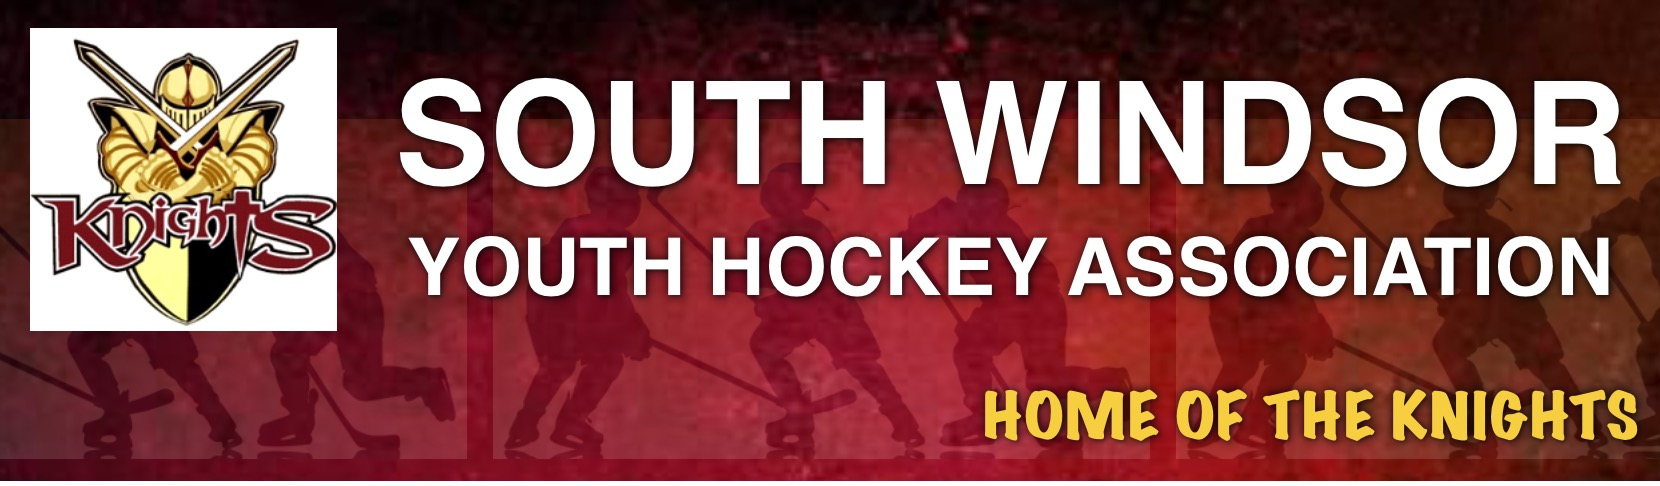 South Windsor Youth Hockey Association, Hockey, Goal, South Windsor Arena